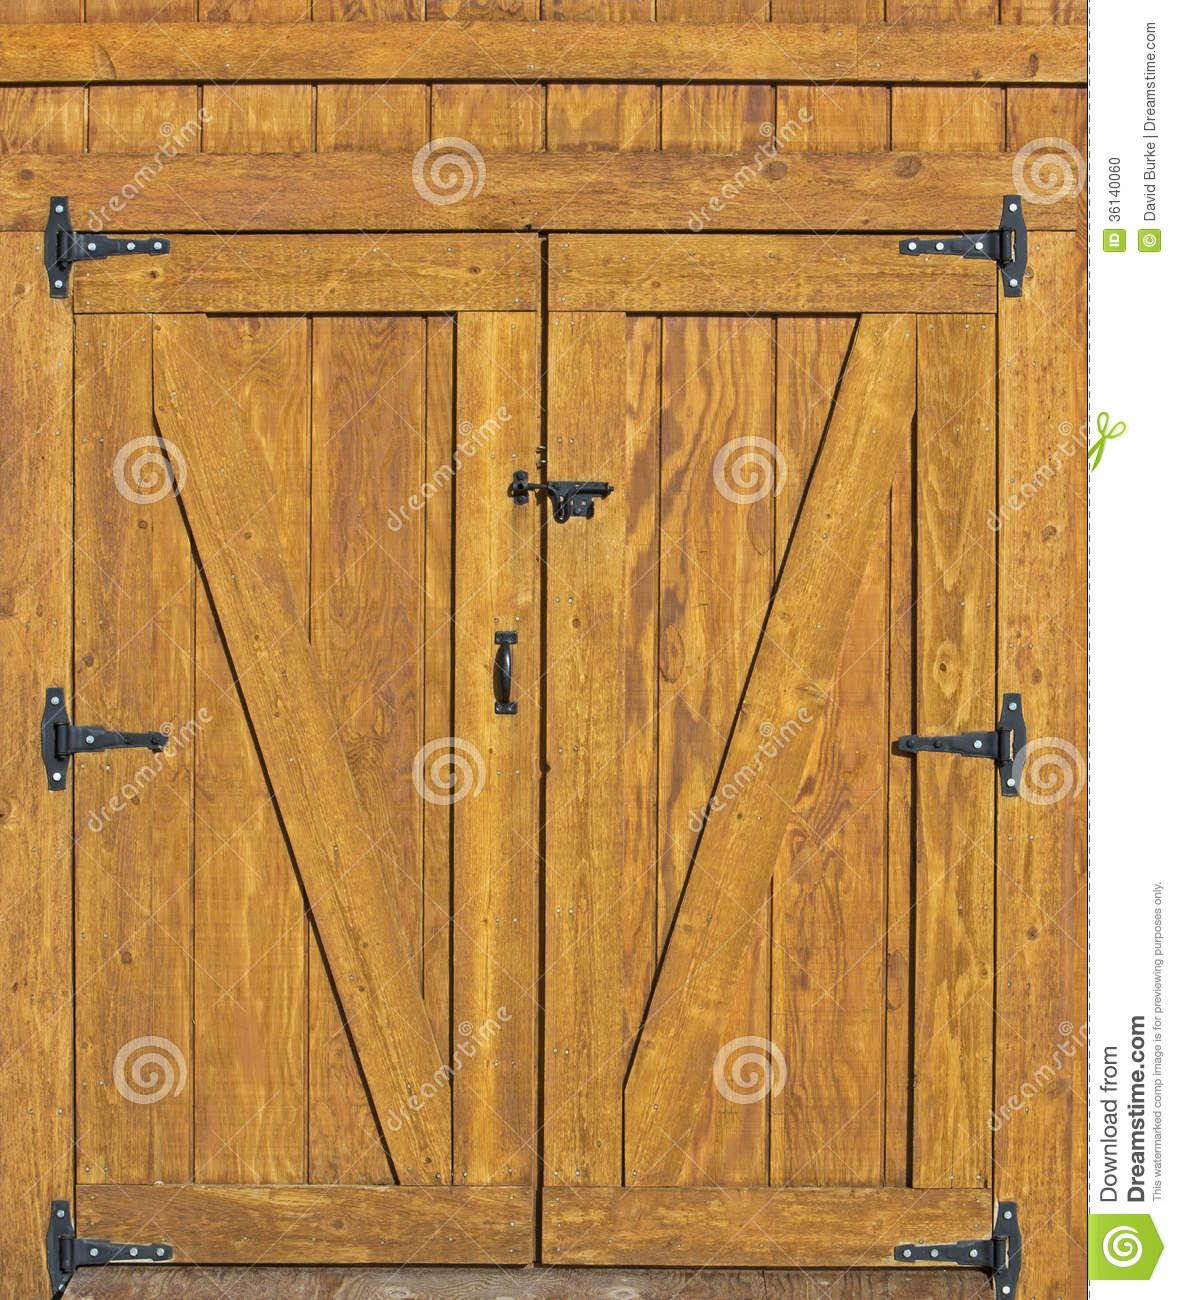 Hinged barn doors - Barn Door Background Rural Building Plank Doors Black Hinges Would